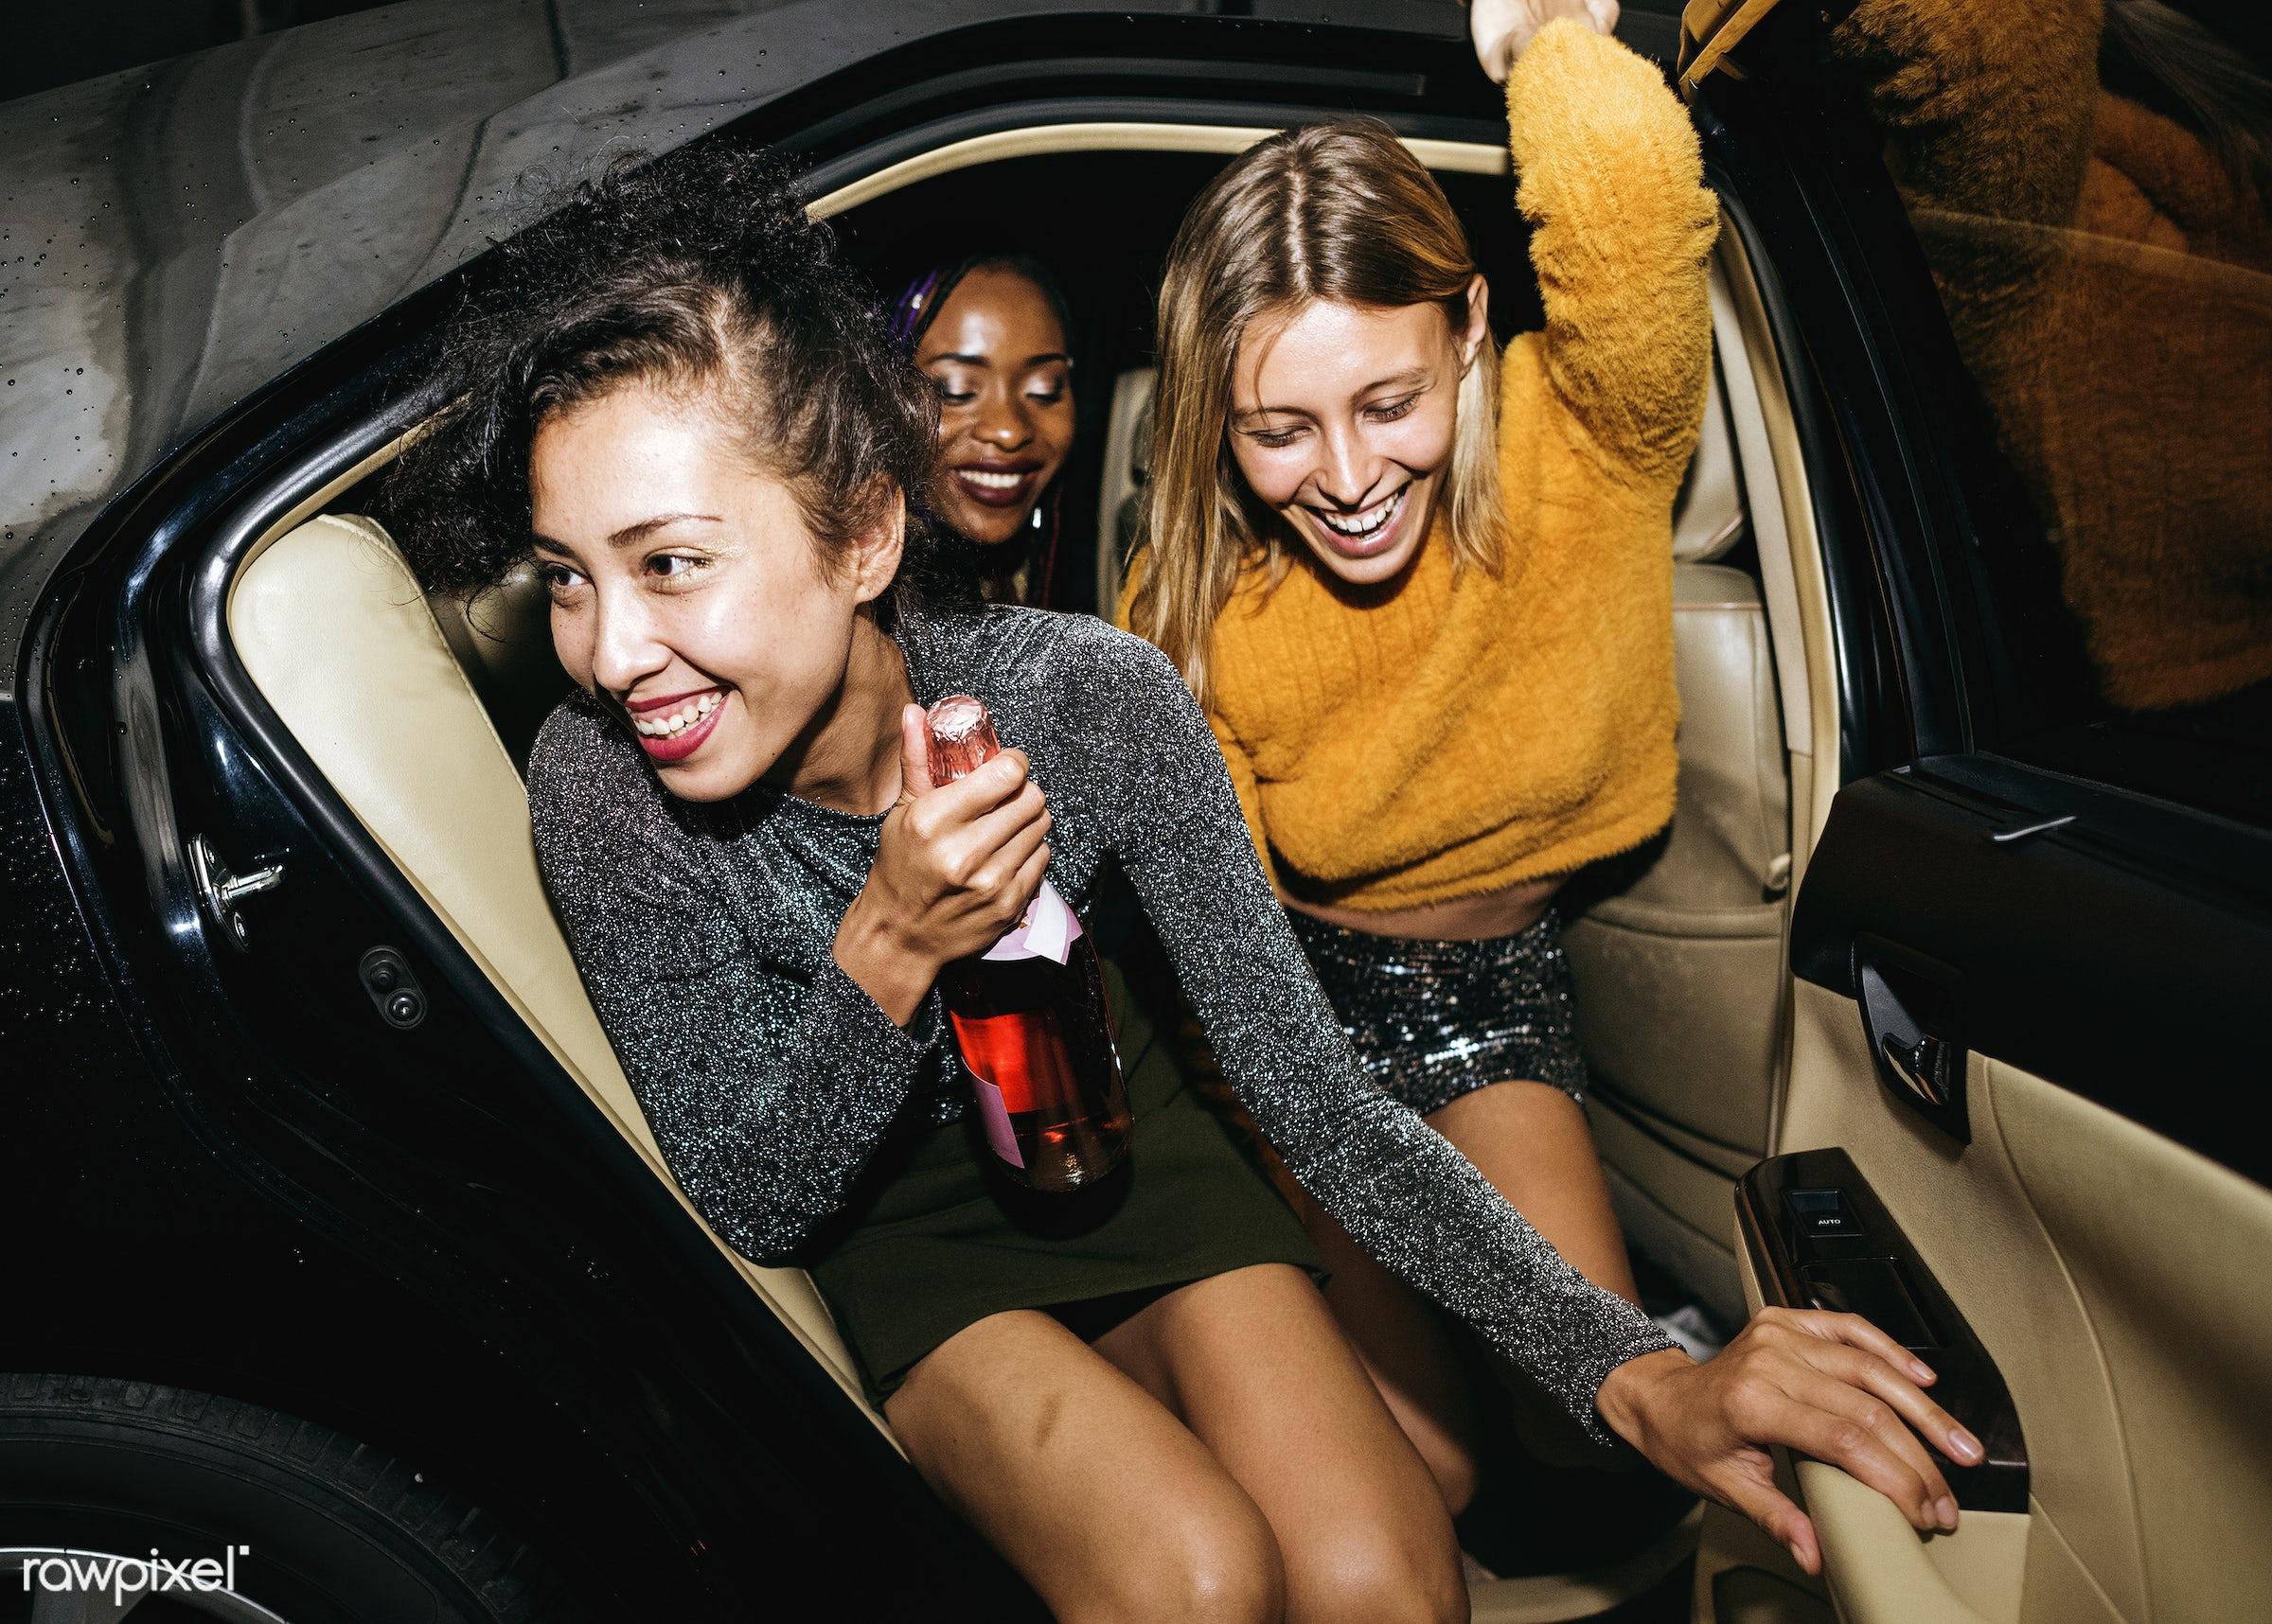 Diverse women in a backseat of a cab - 2018, african american, african descent, arrive, backseat, beverage, black, bottle,...